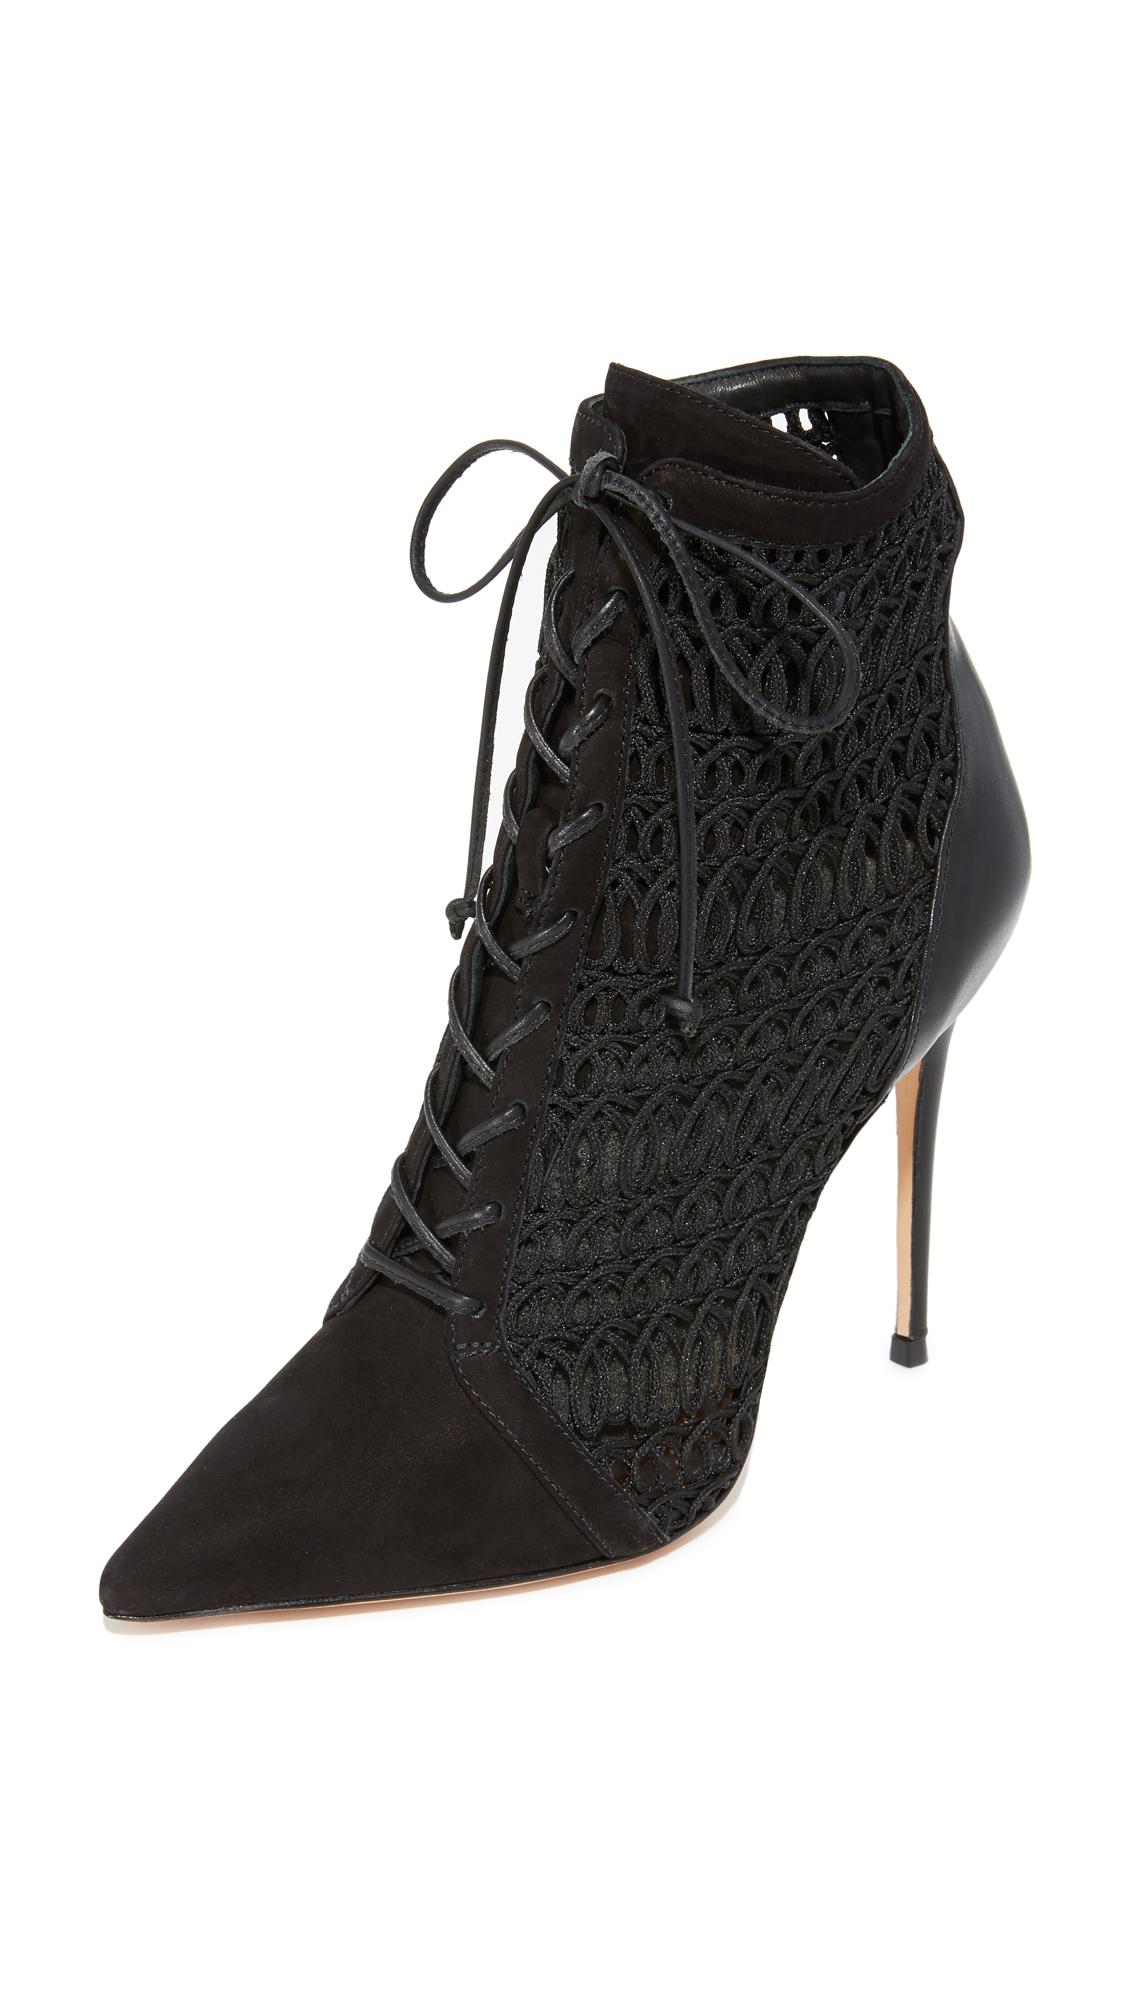 Schutz Jolana Lace Up Booties - Black